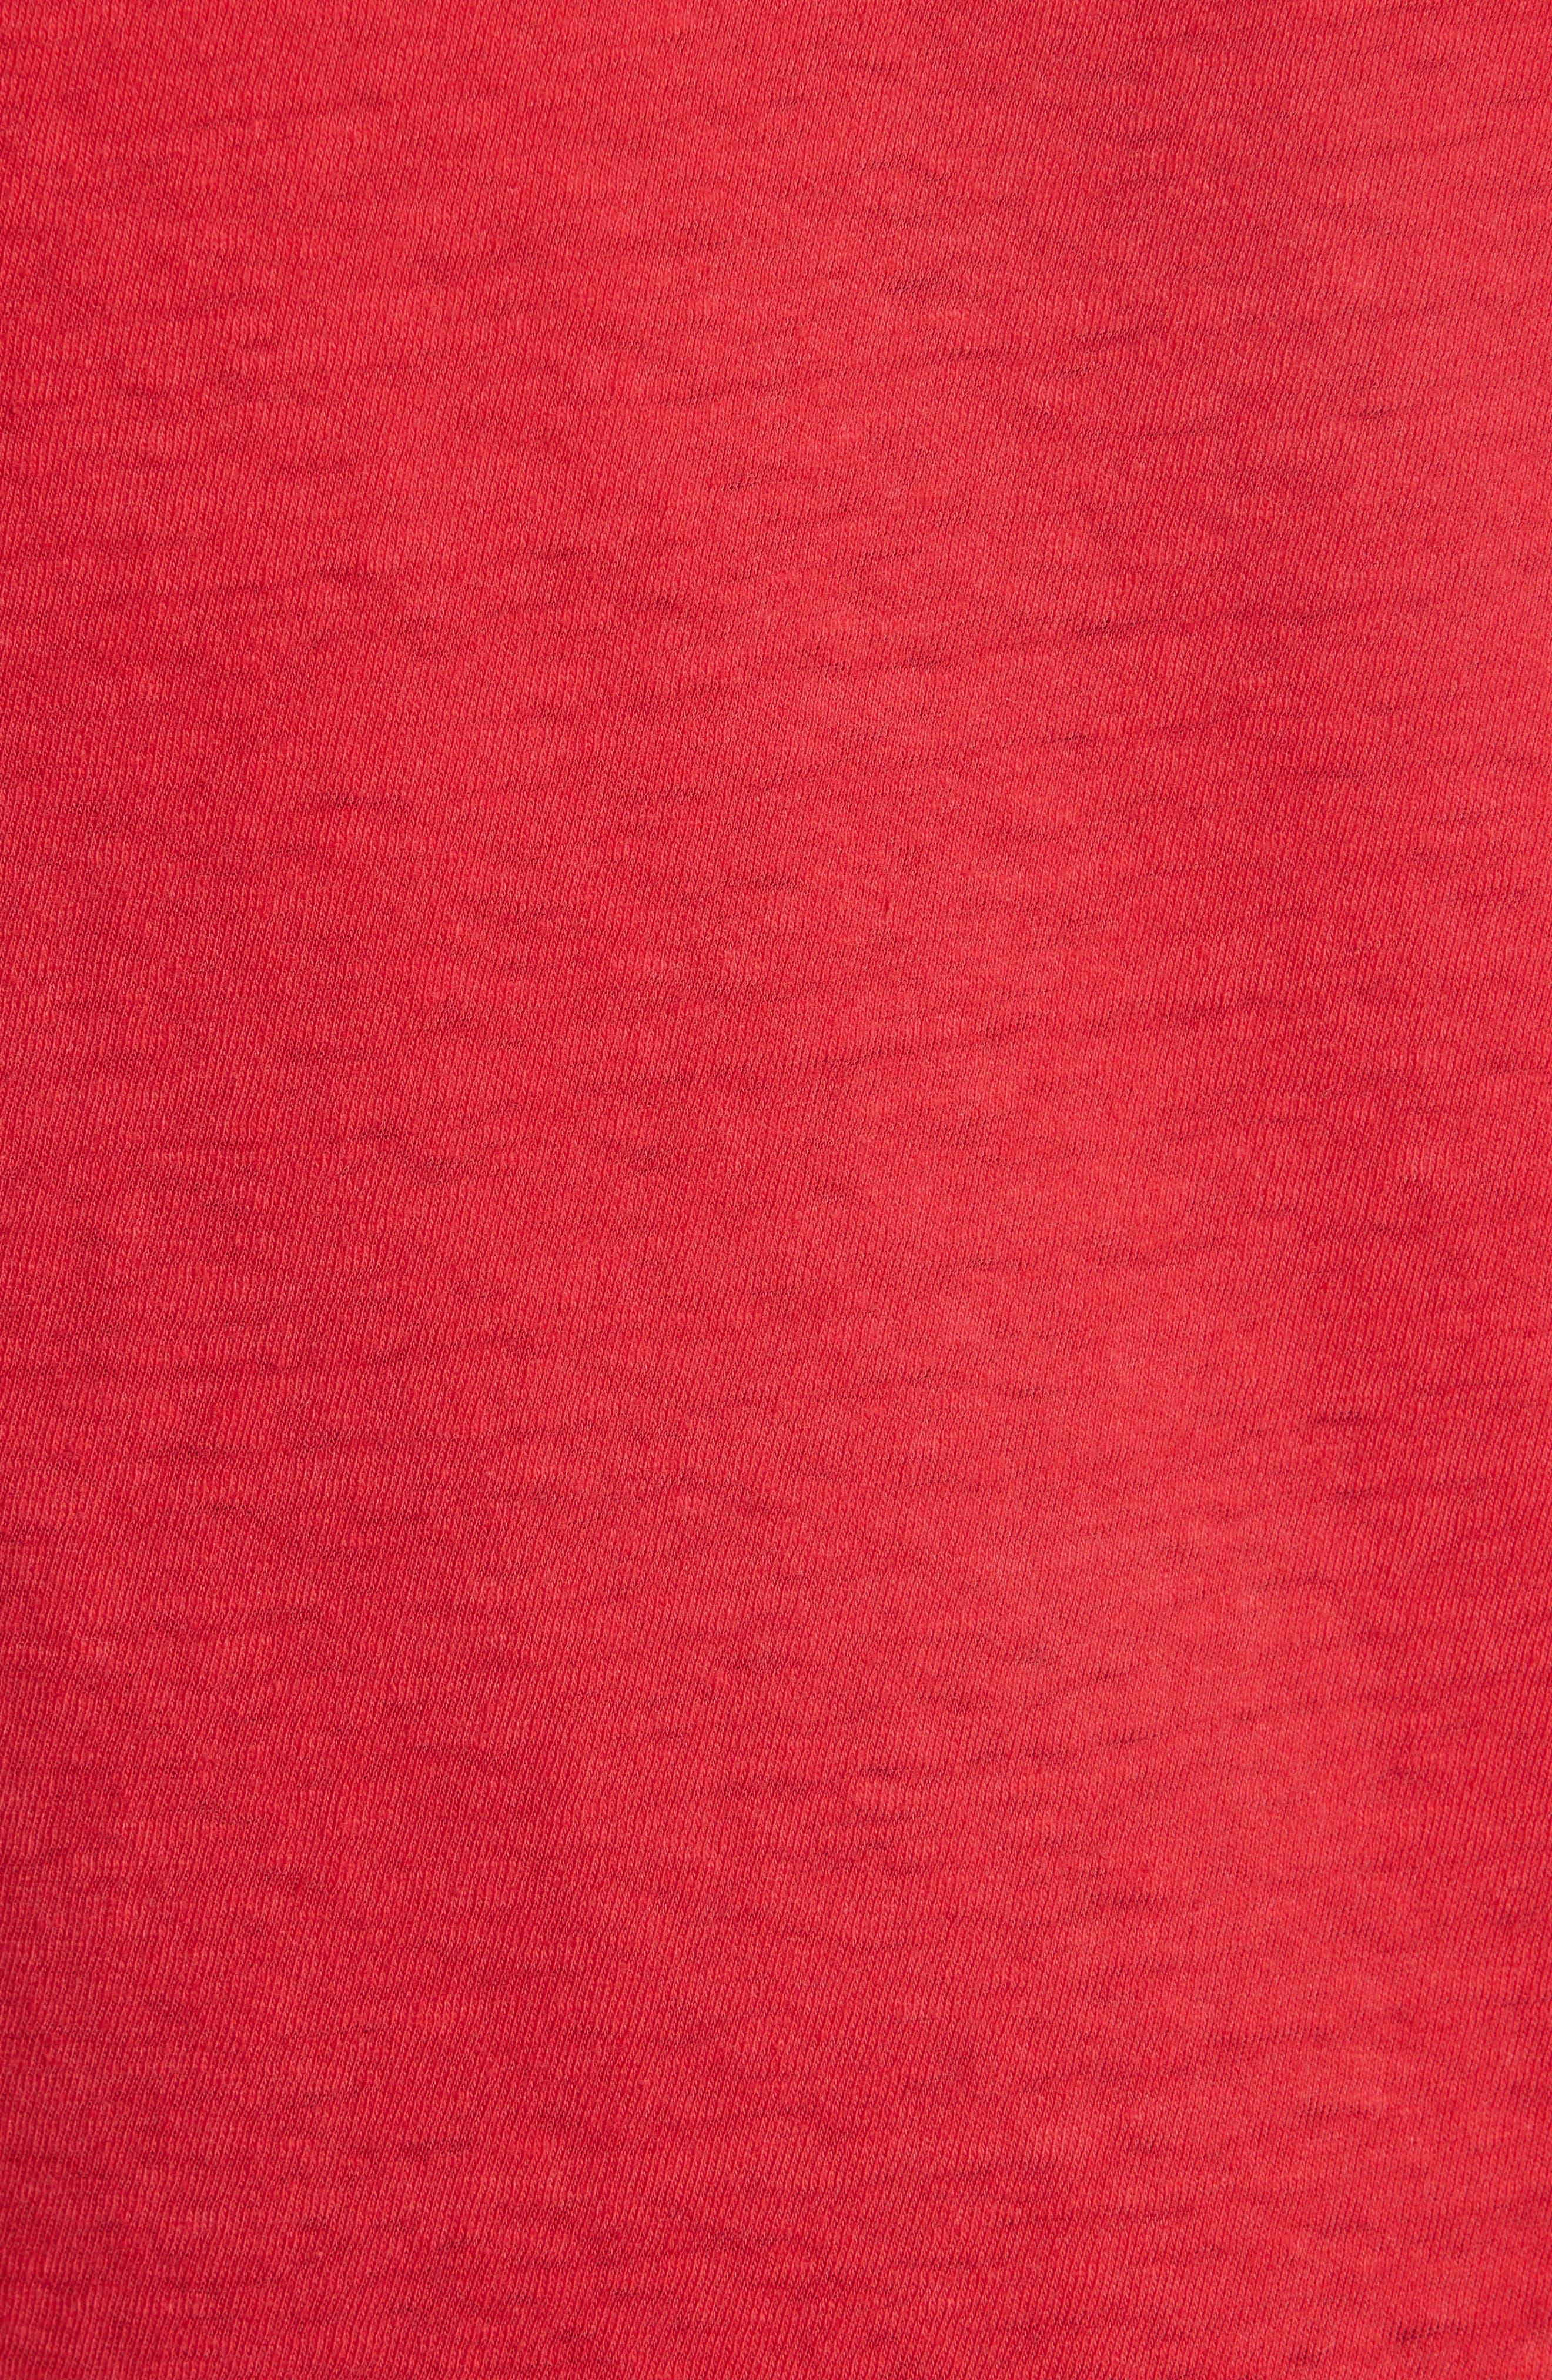 Boys Graphic T-Shirt,                             Alternate thumbnail 5, color,                             600